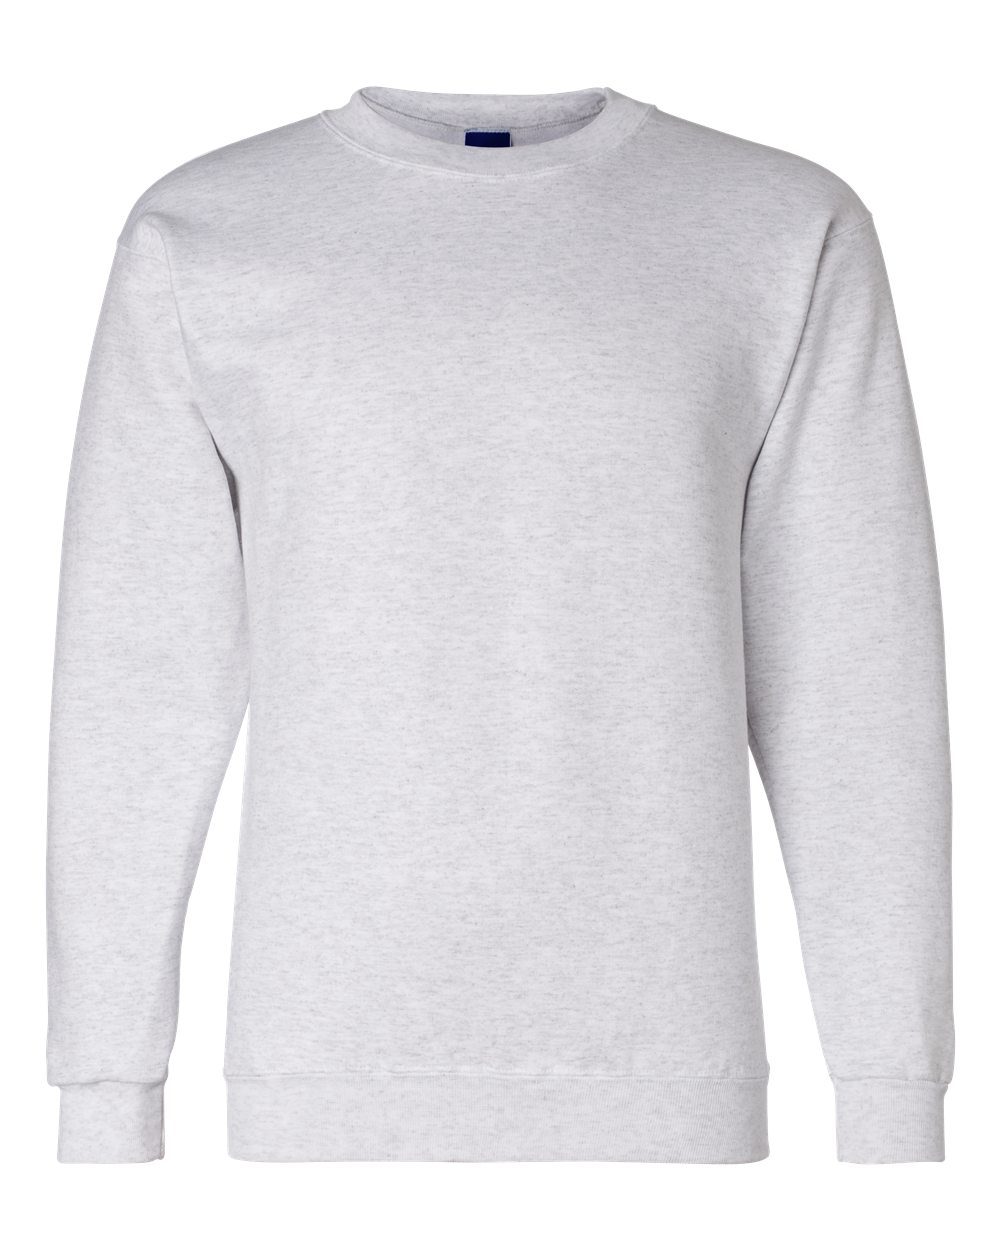 Champion Double Dry Eco Crewneck Sweatshirt